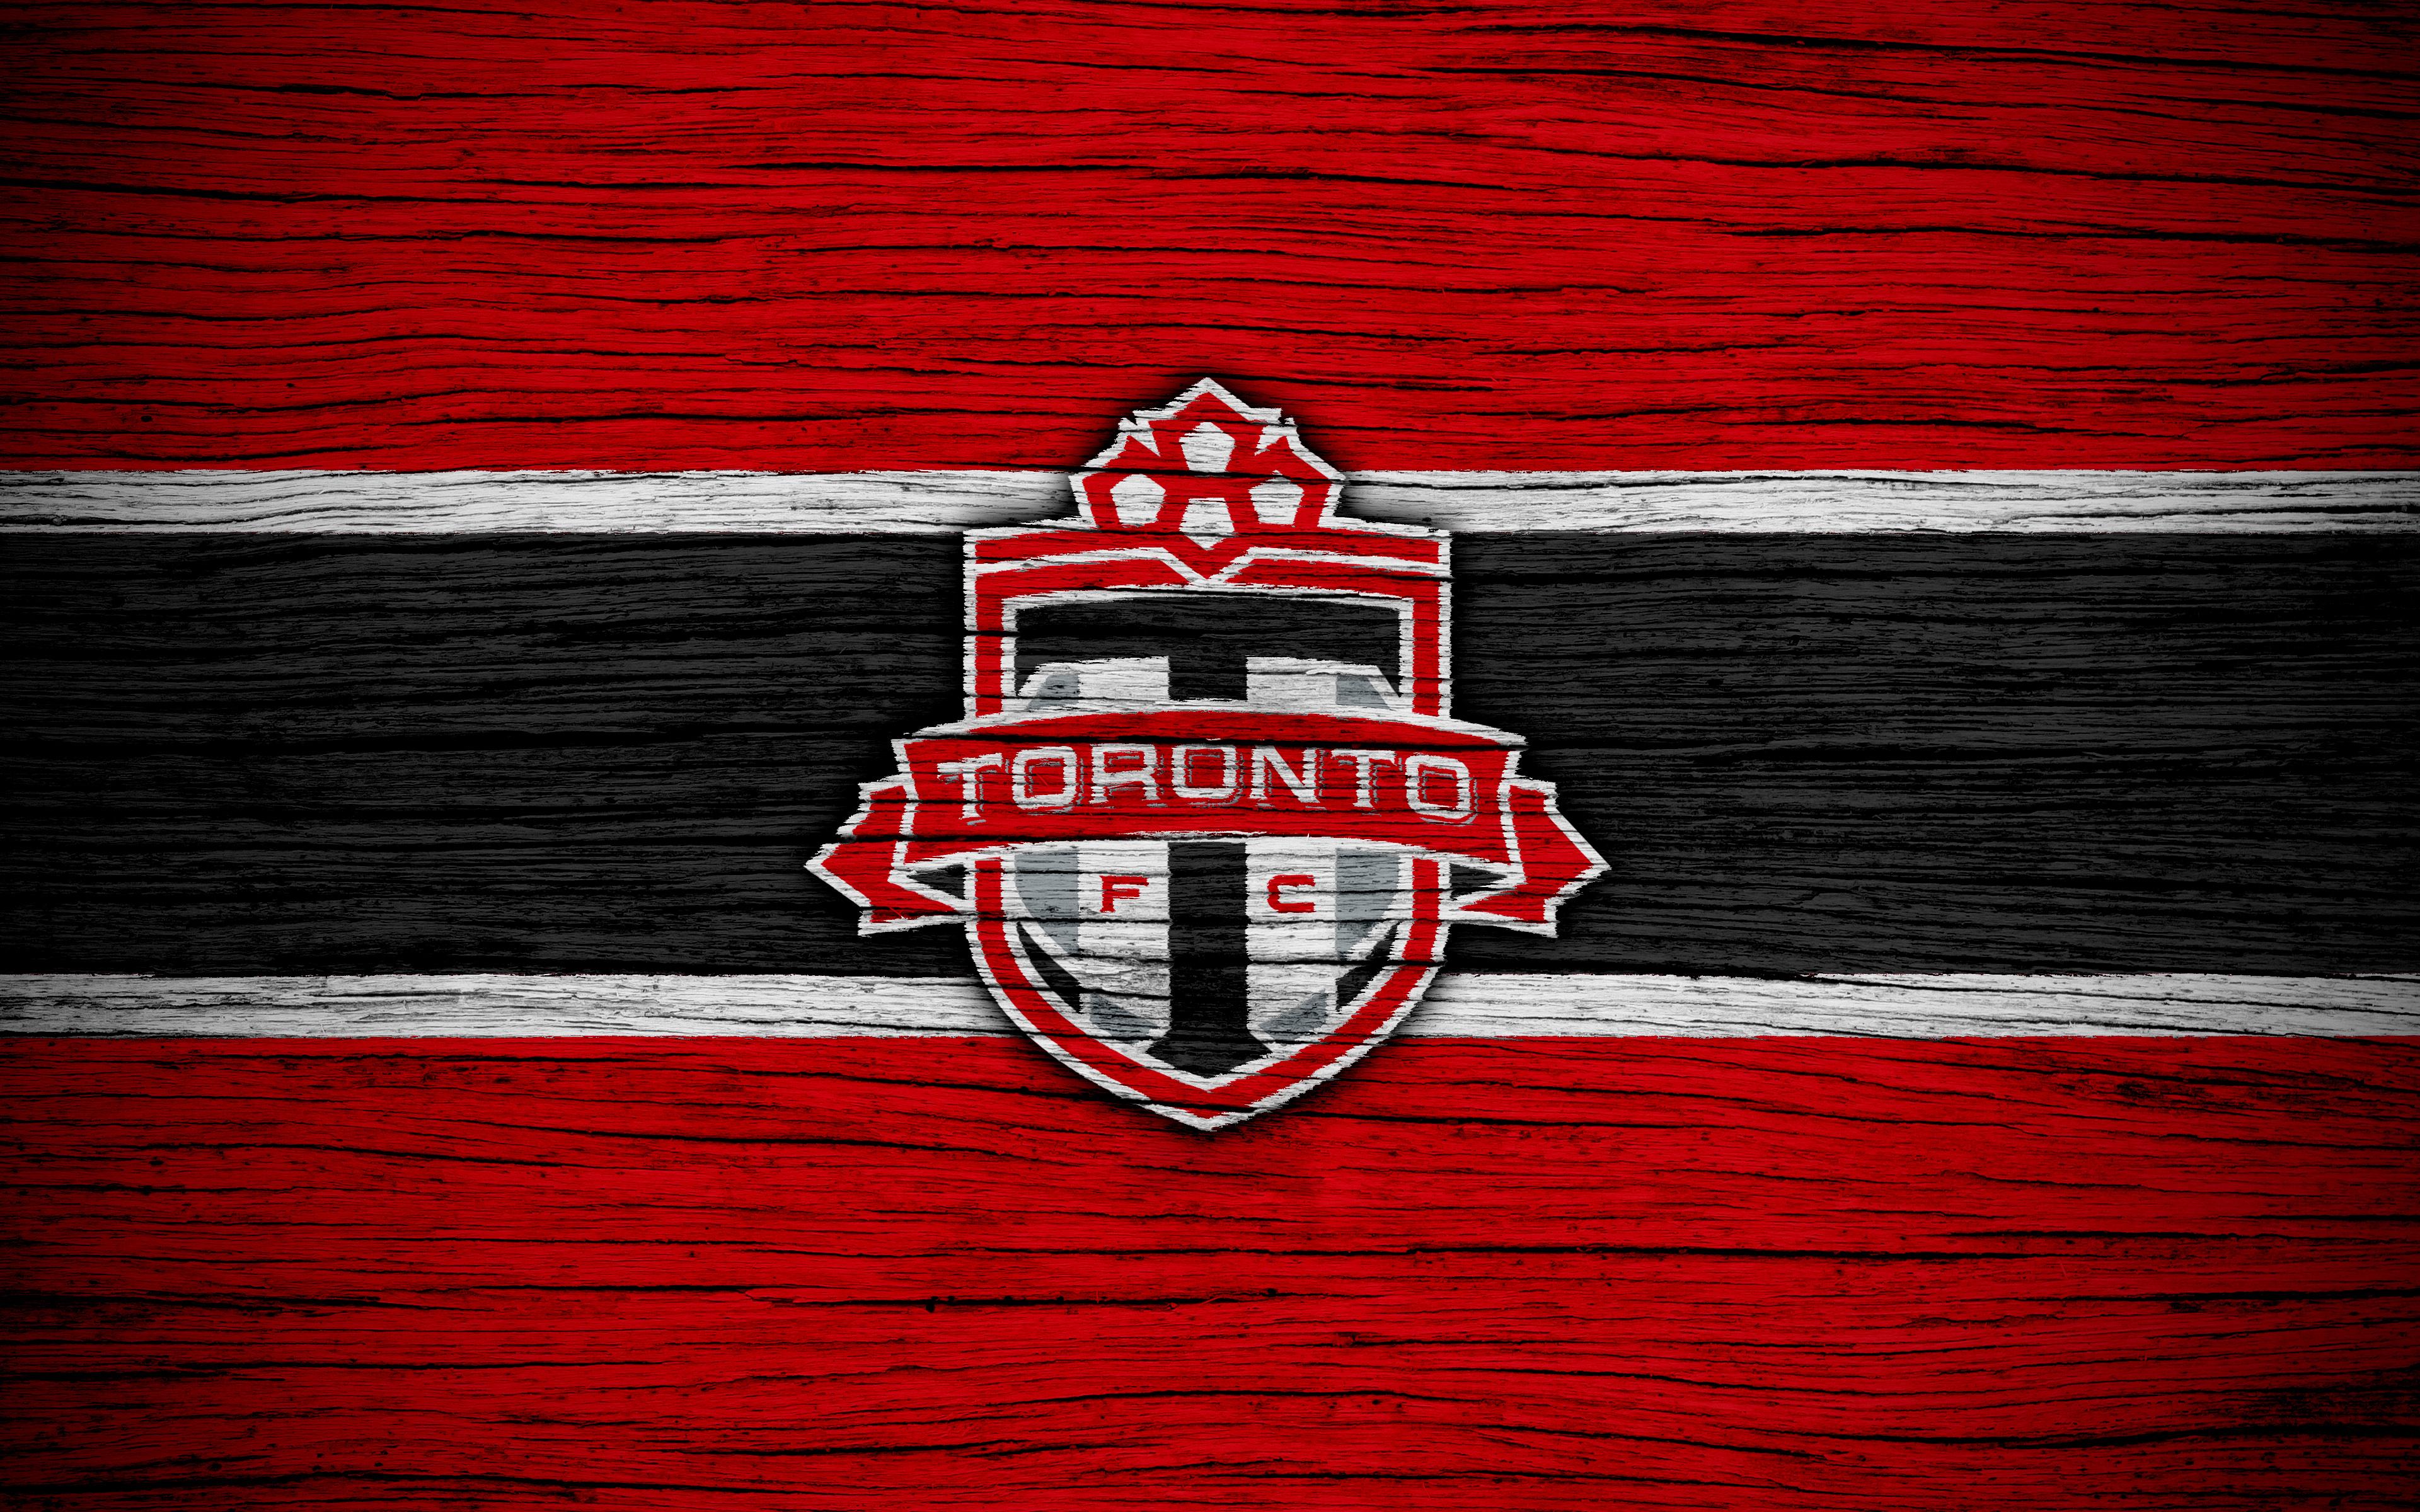 Toronto FC 4k Ultra HD Wallpaper Background Image 3840x2400 3840x2400